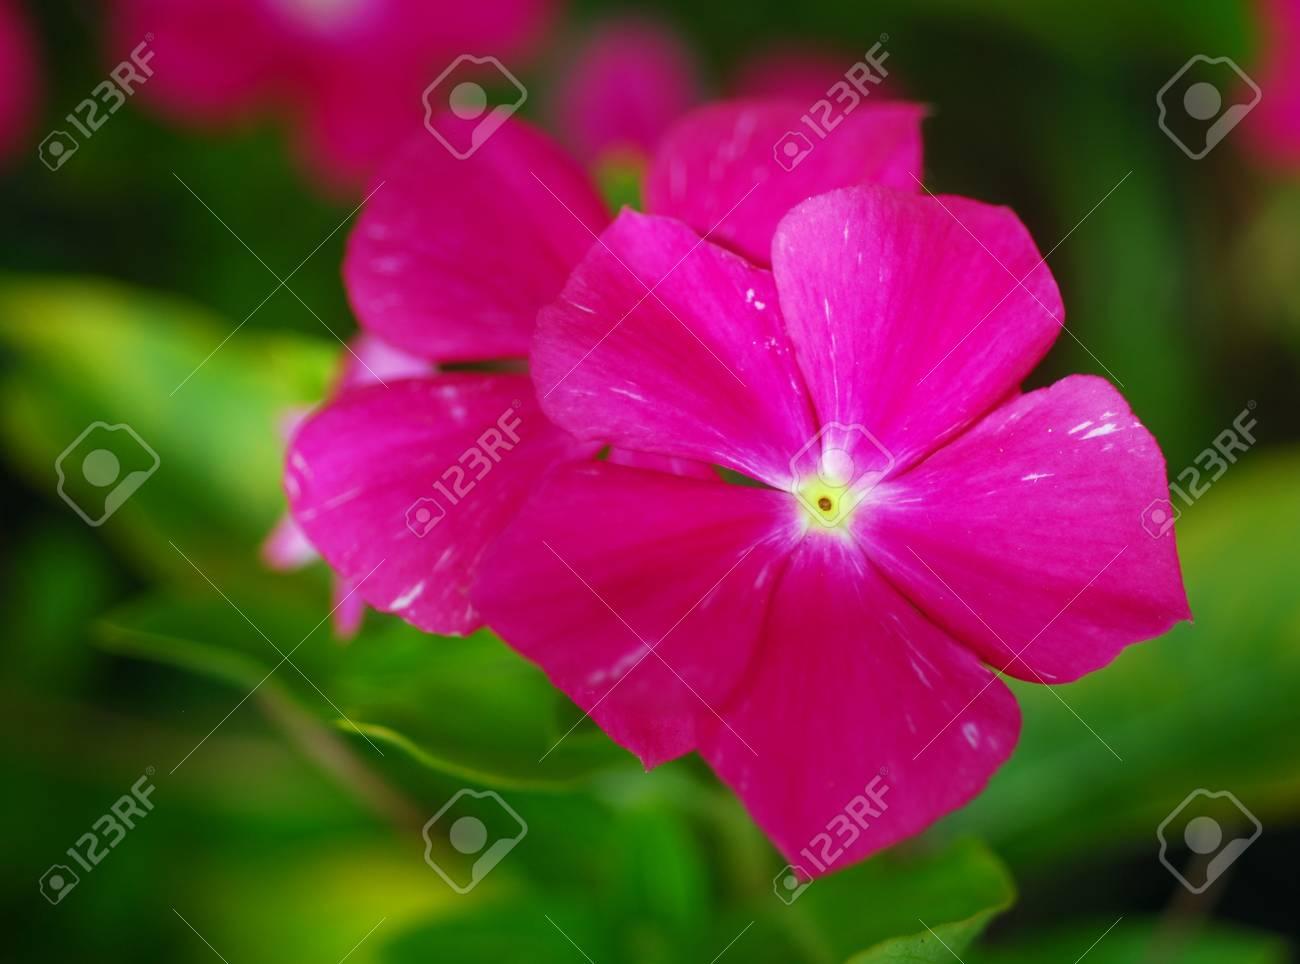 Pink Vinca Periwinkle Flower In Bloom In Spring Stock Photo Picture